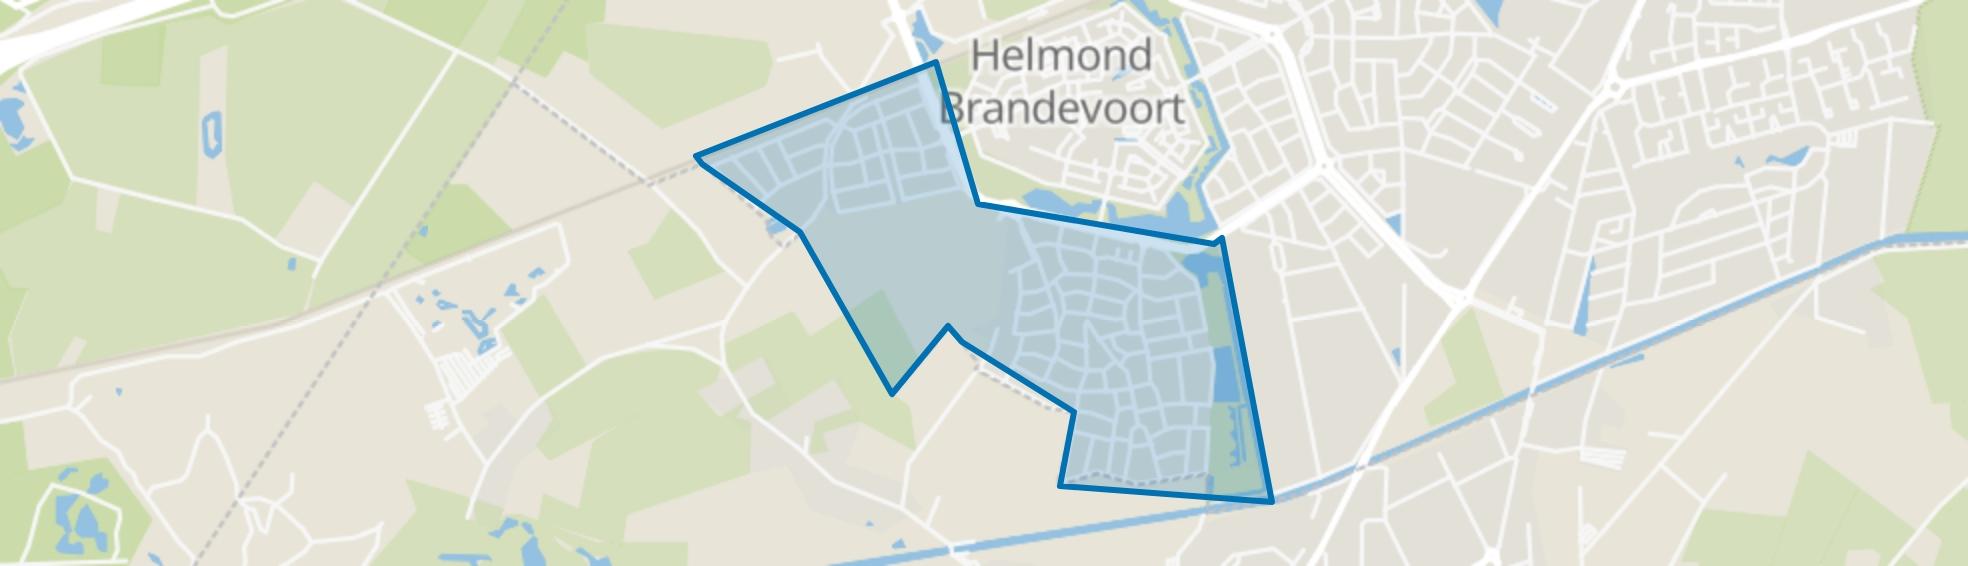 Stepekolk, Helmond map